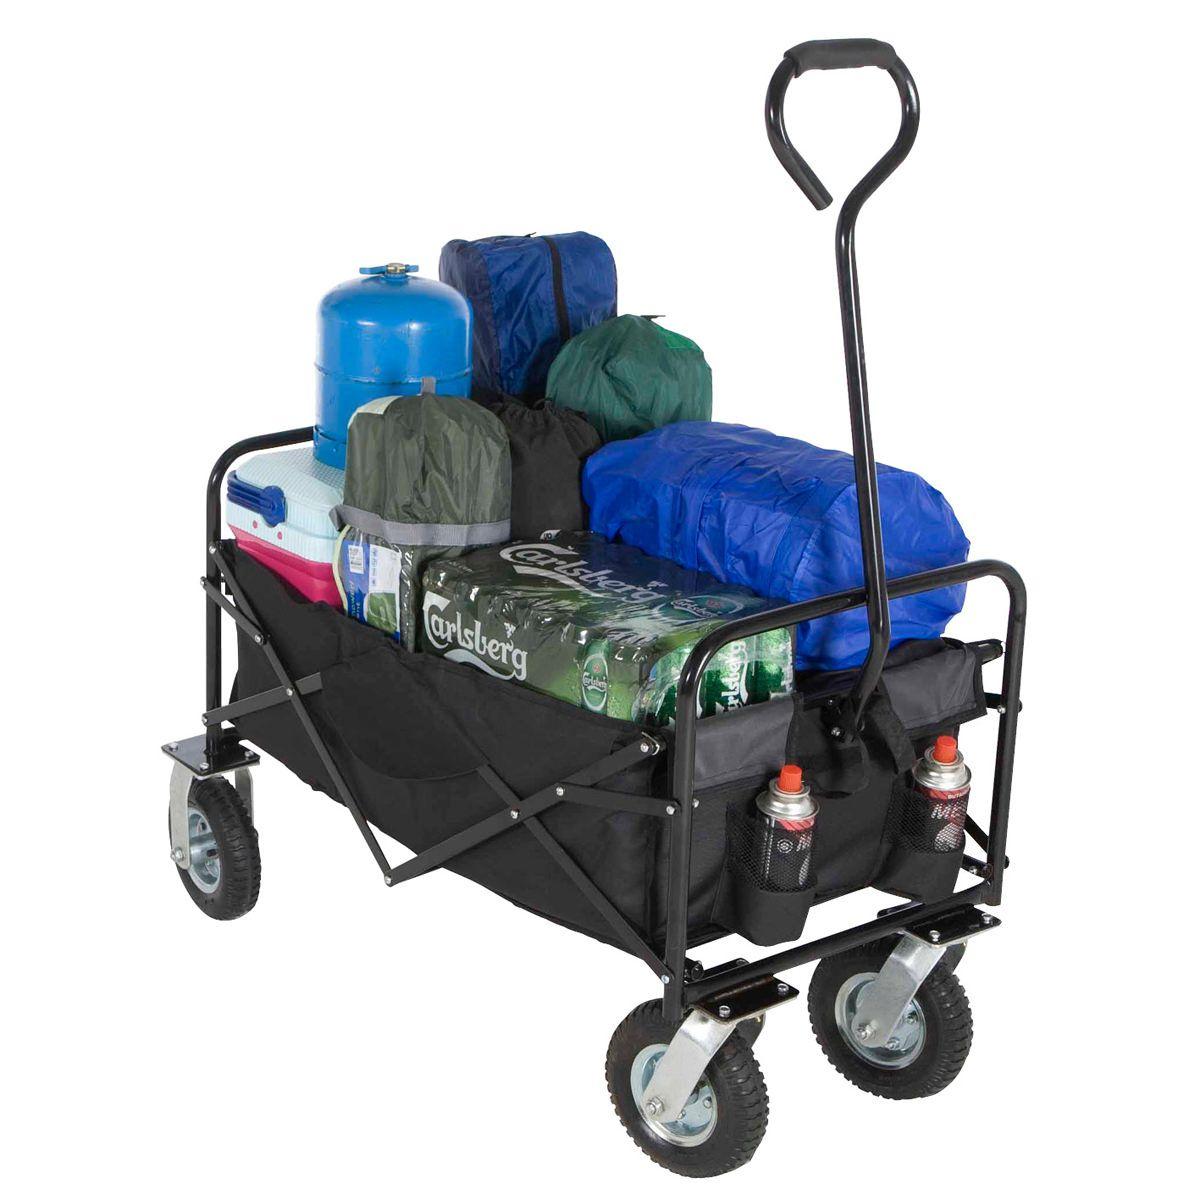 3b6419aa6d66 Folding Trolley Cart | Camping Carts | Camping cart, Camping ...